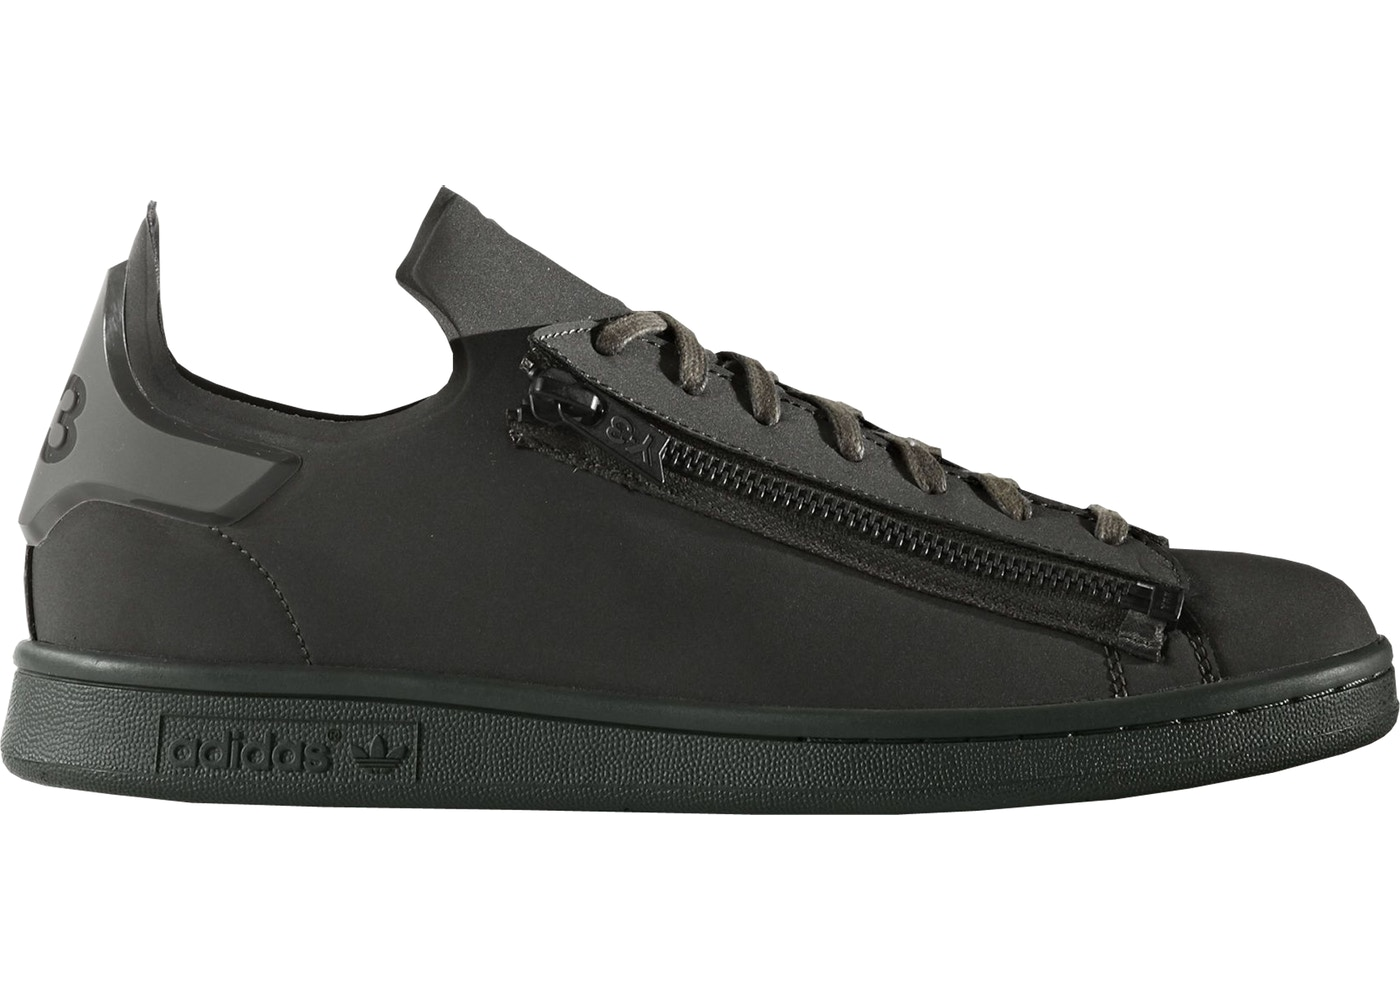 3798cb65d40 adidas Y-3 Stan Smith Zip Dark Olive - CG3208